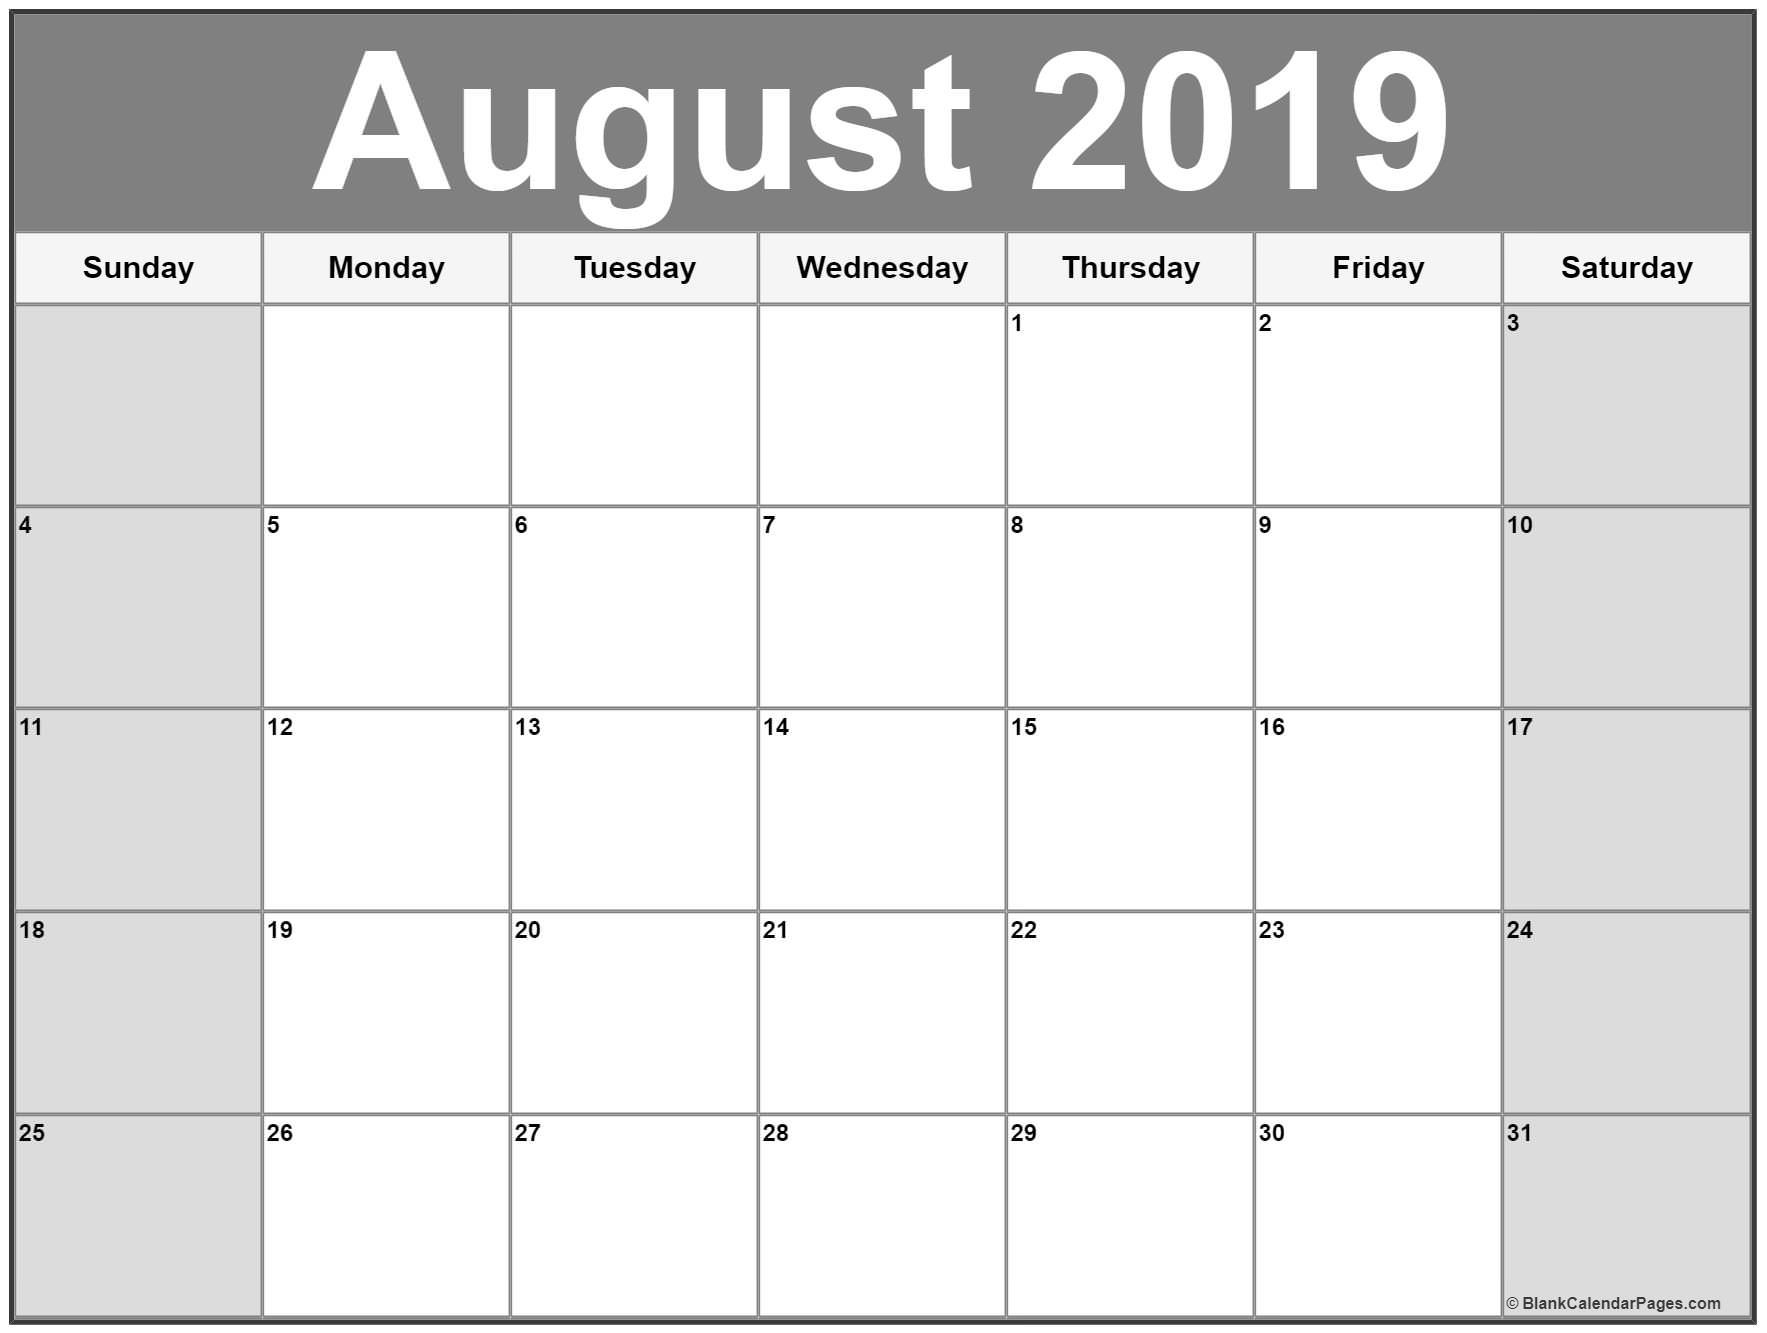 August 2019 Calendar Printable Free   Calendar Printables